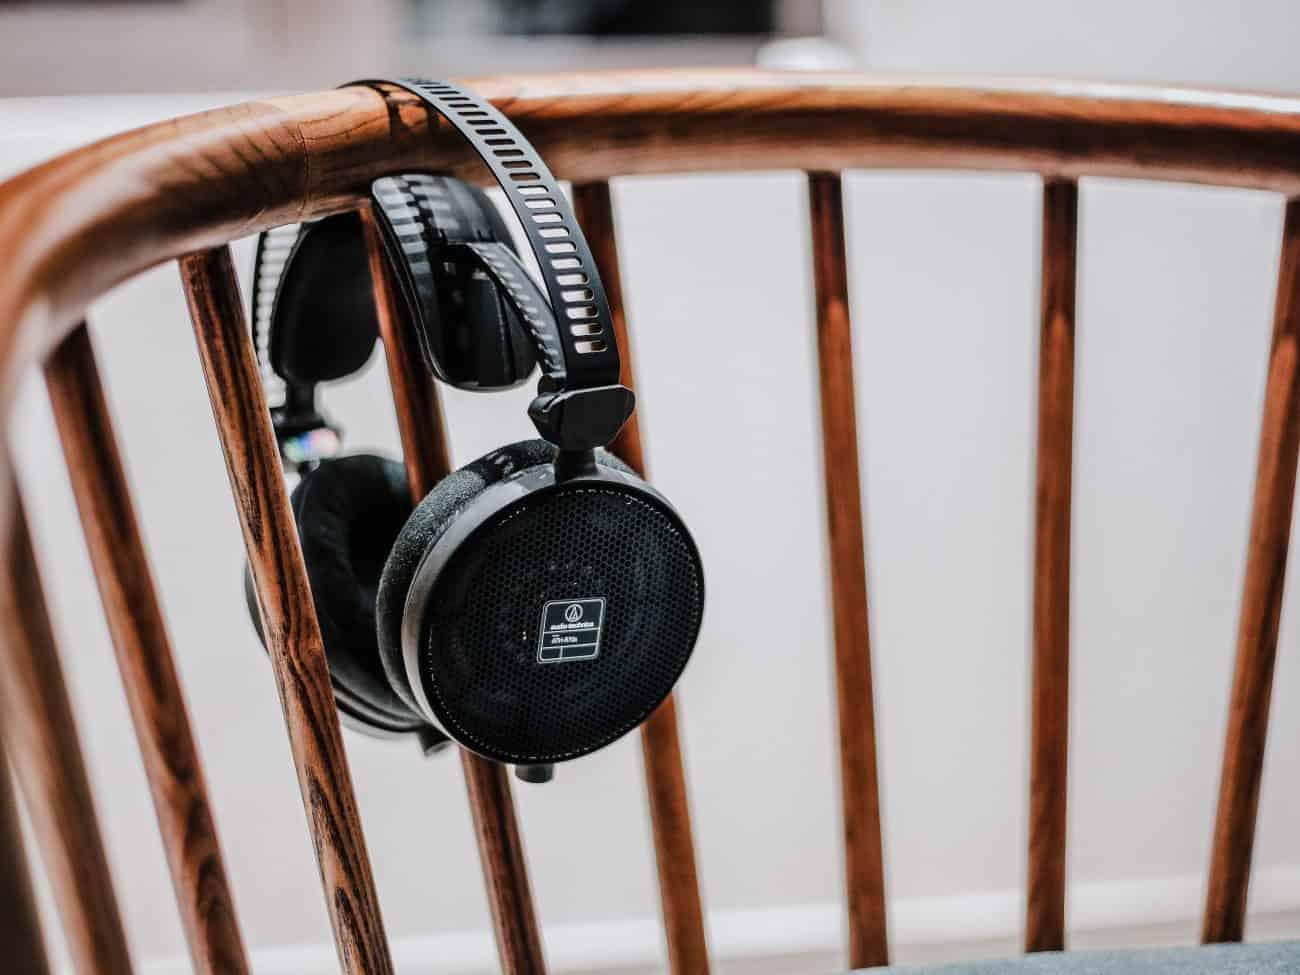 Kopfhörerverstärker: Test & Empfehlungen (02/20)